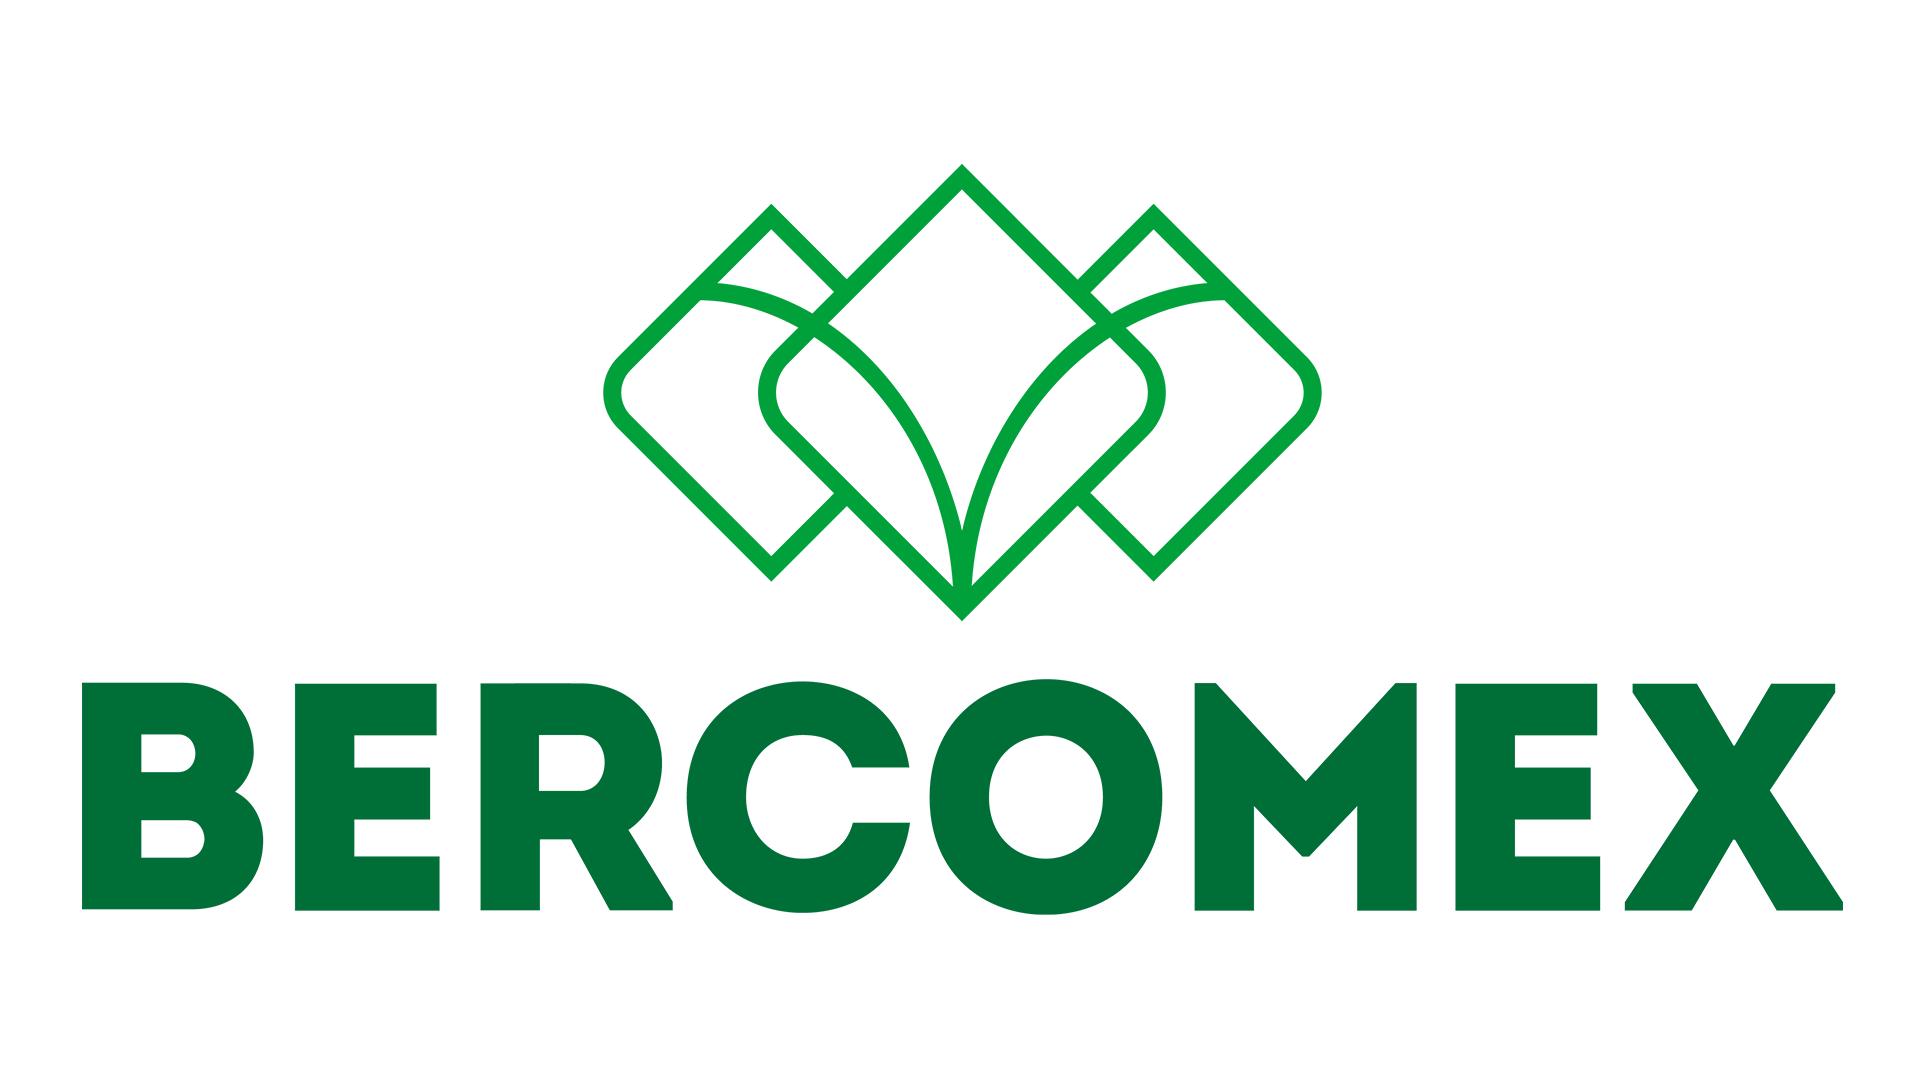 BERCOMEX.png